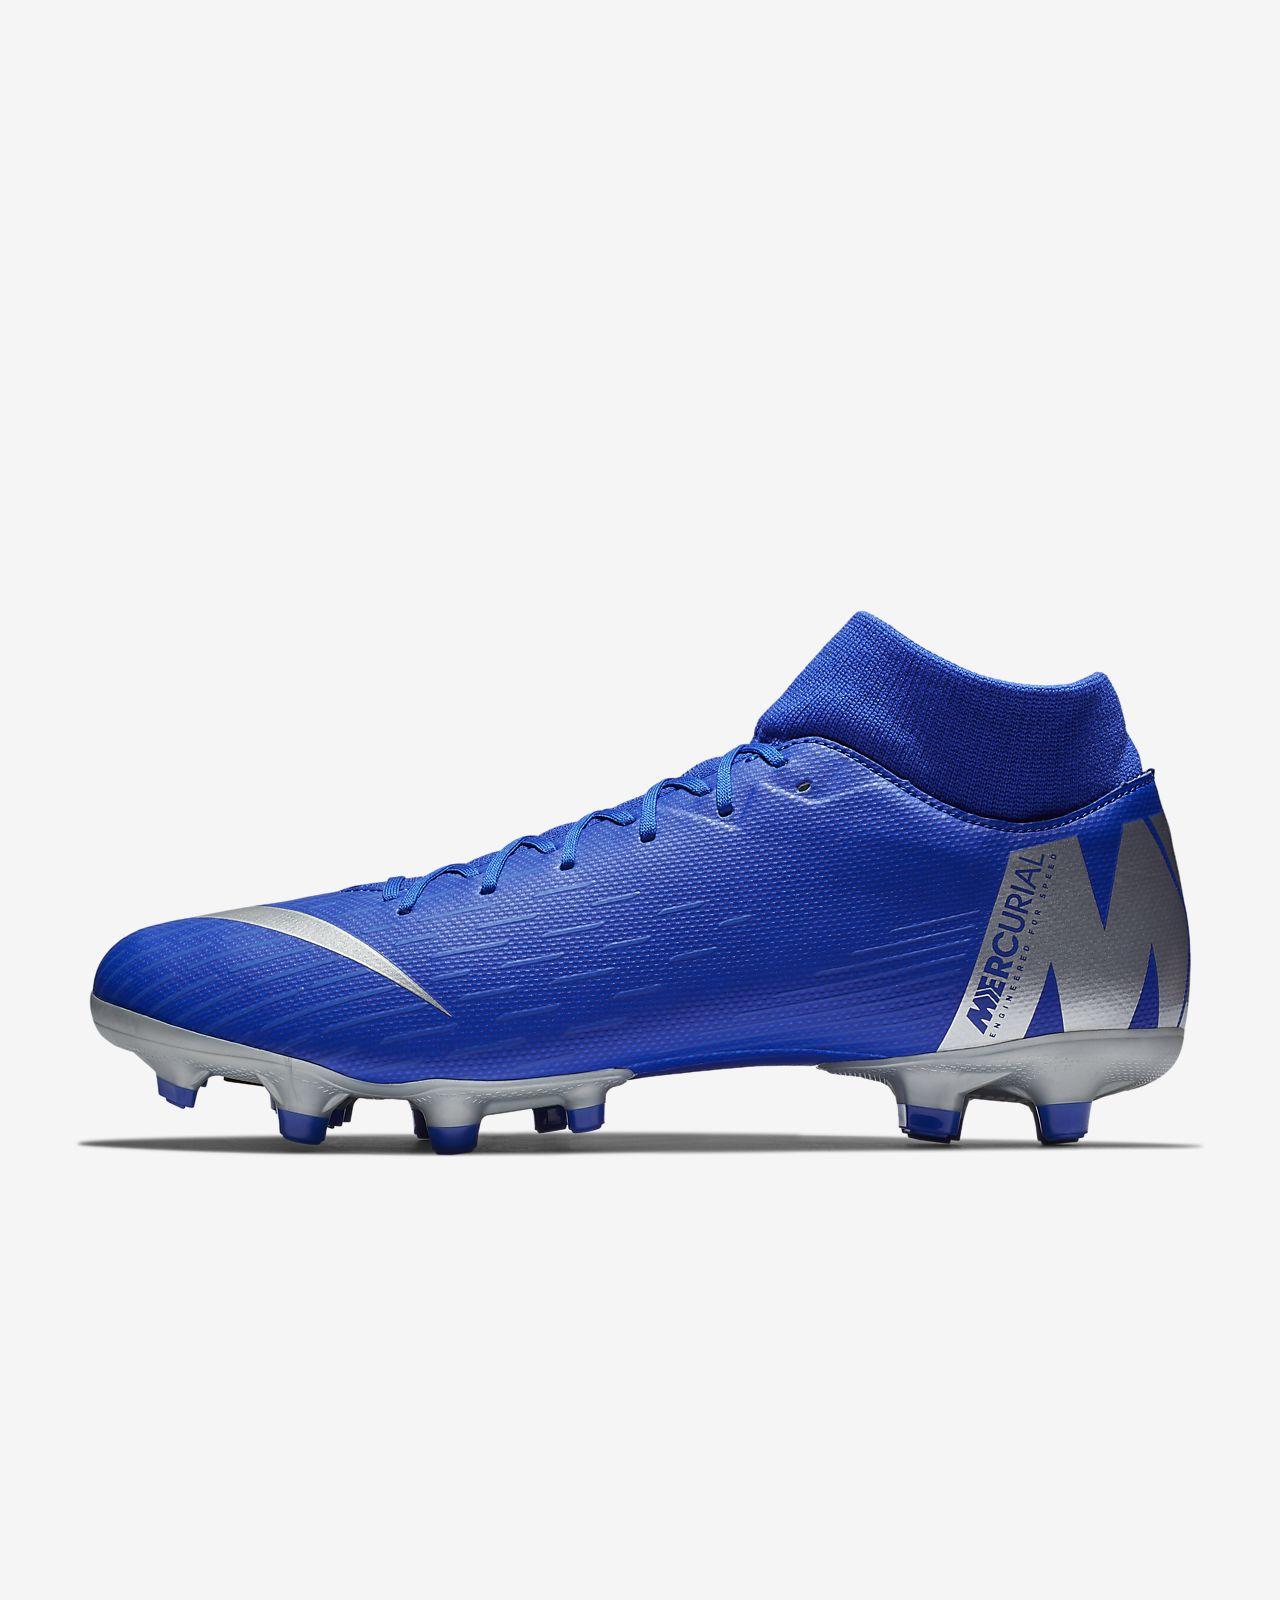 best authentic 7b1af 5d4ca ... Scarpa da calcio multiterreno Nike Mercurial Superfly 6 Academy MG